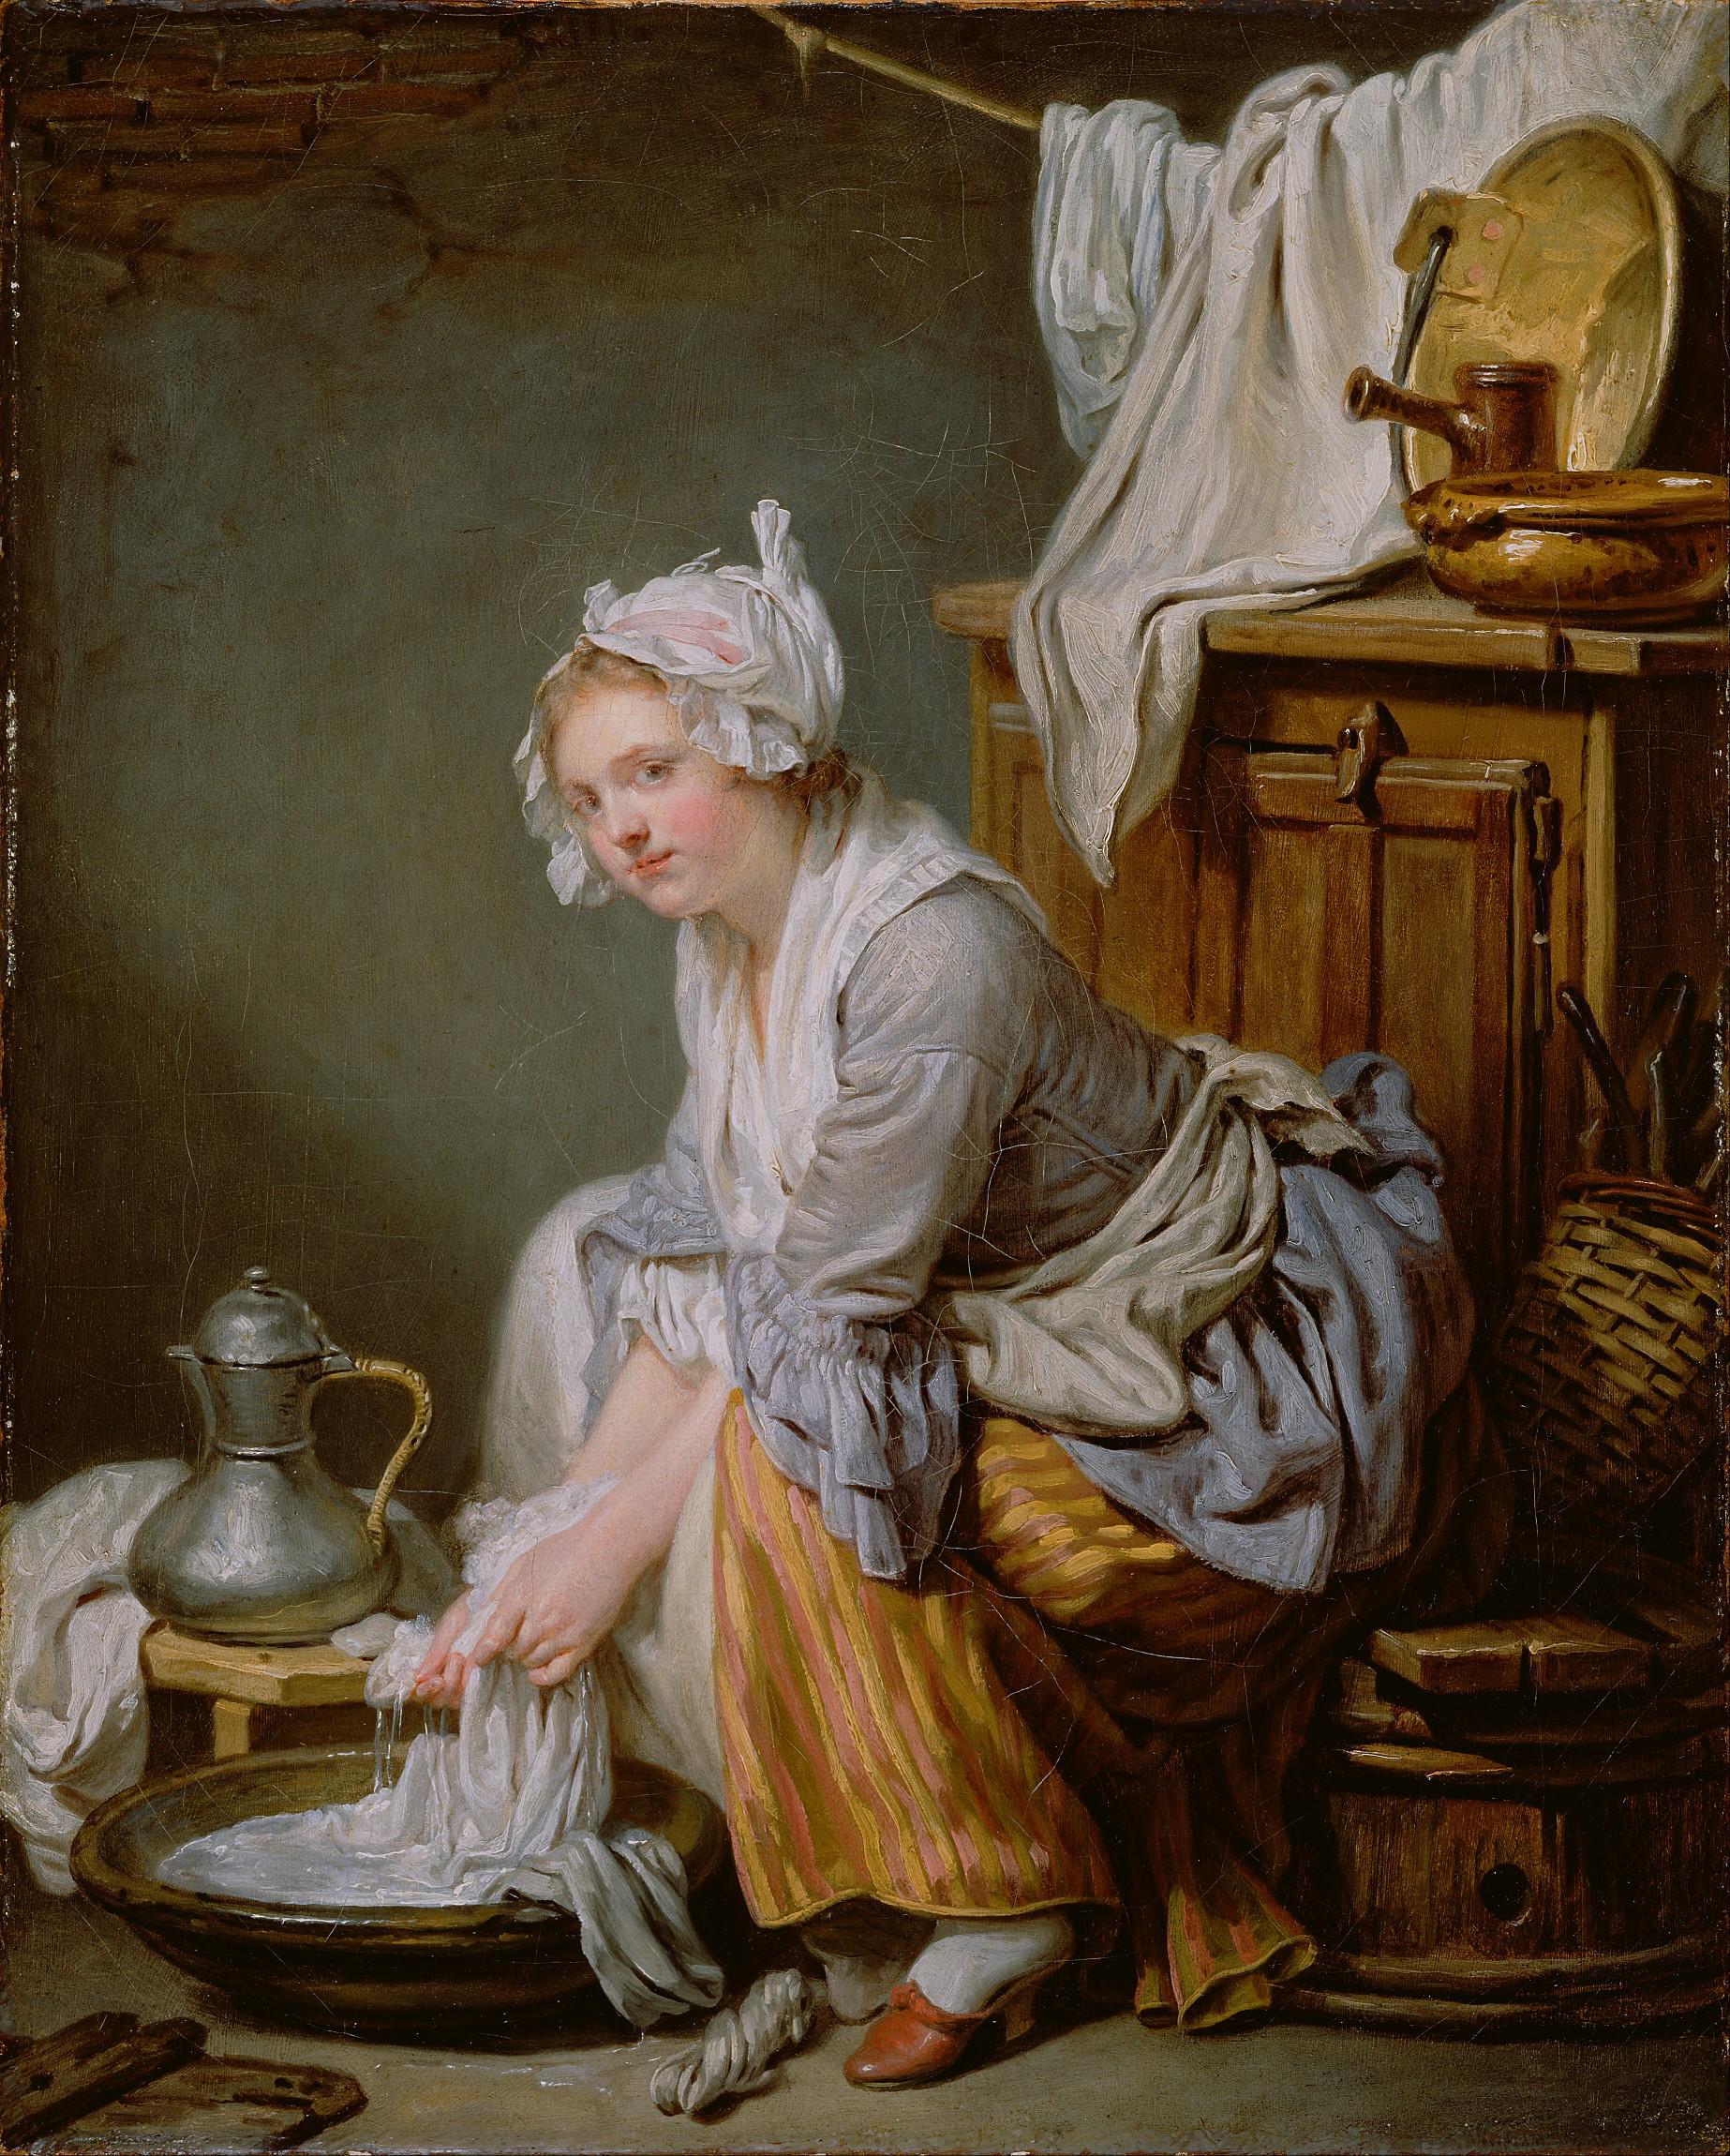 Jean-Baptiste Greuze Siftingthepast_the-laundress_jean-baptiste-greuzefrench1725-1805_1761